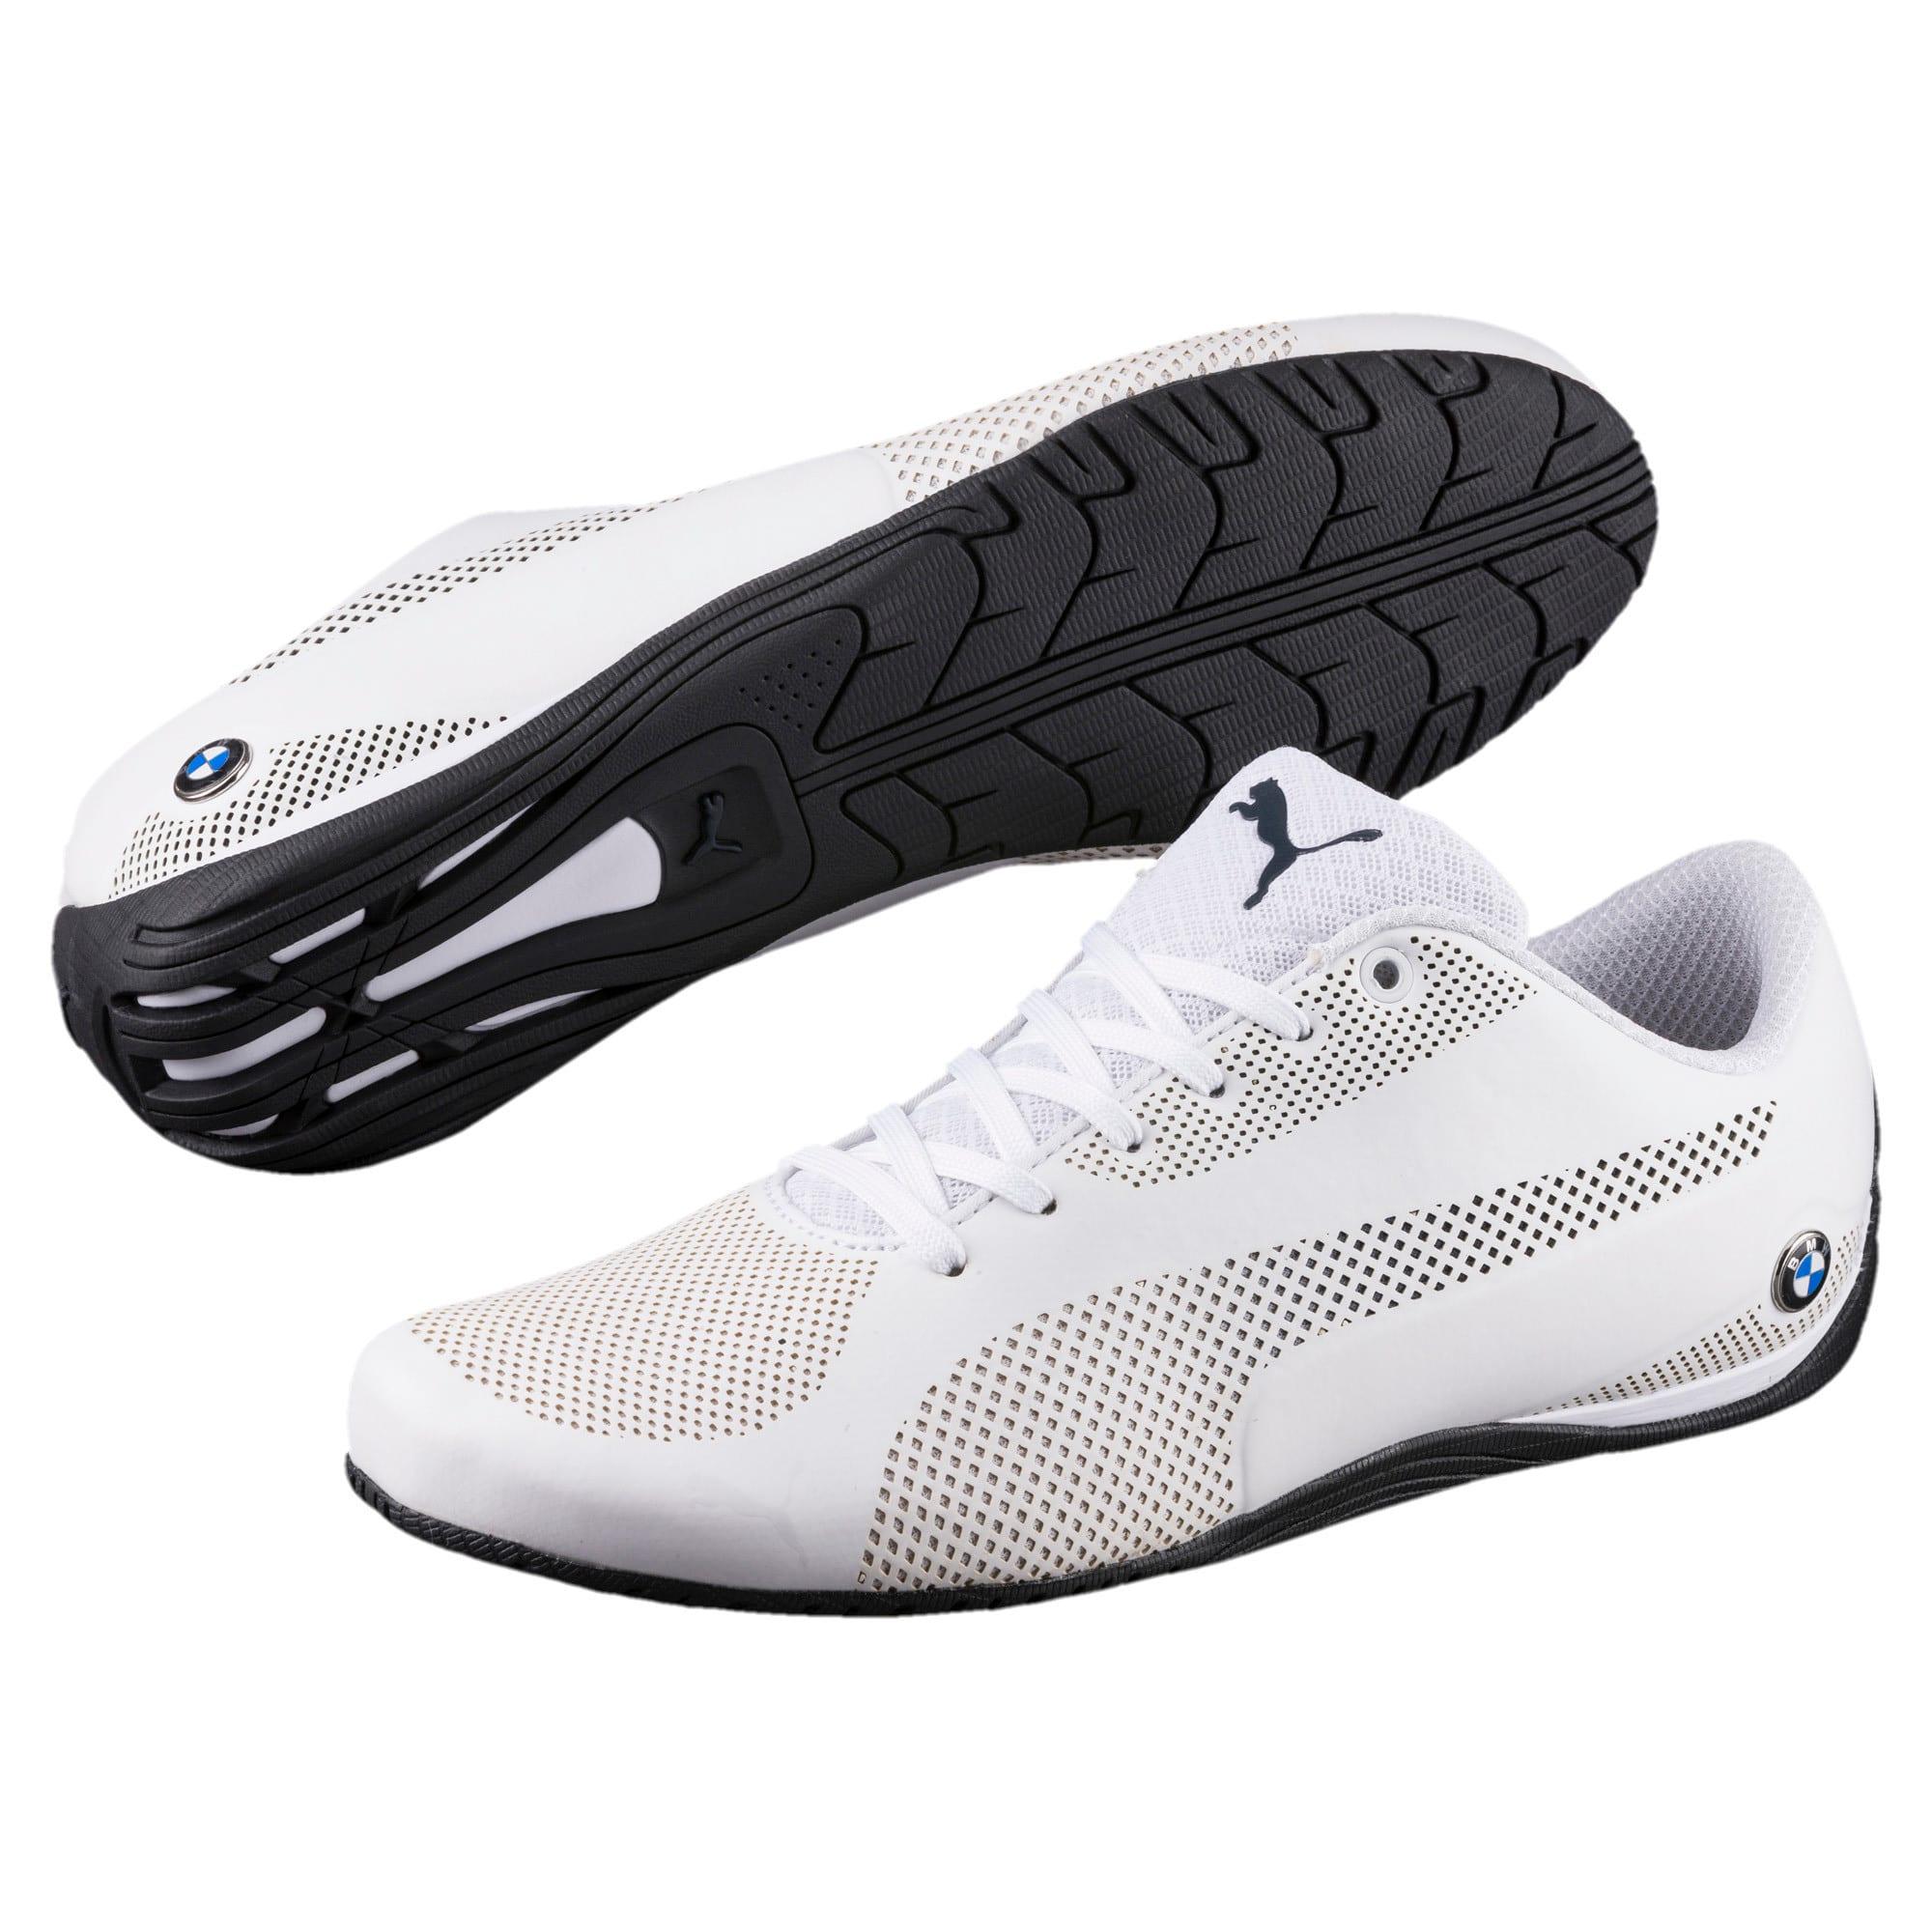 Thumbnail 2 of BMW Motorsport Drift Cat 5 Ultra Shoes, Puma Wht-Team Blu-Hgh Rsk Rd, medium